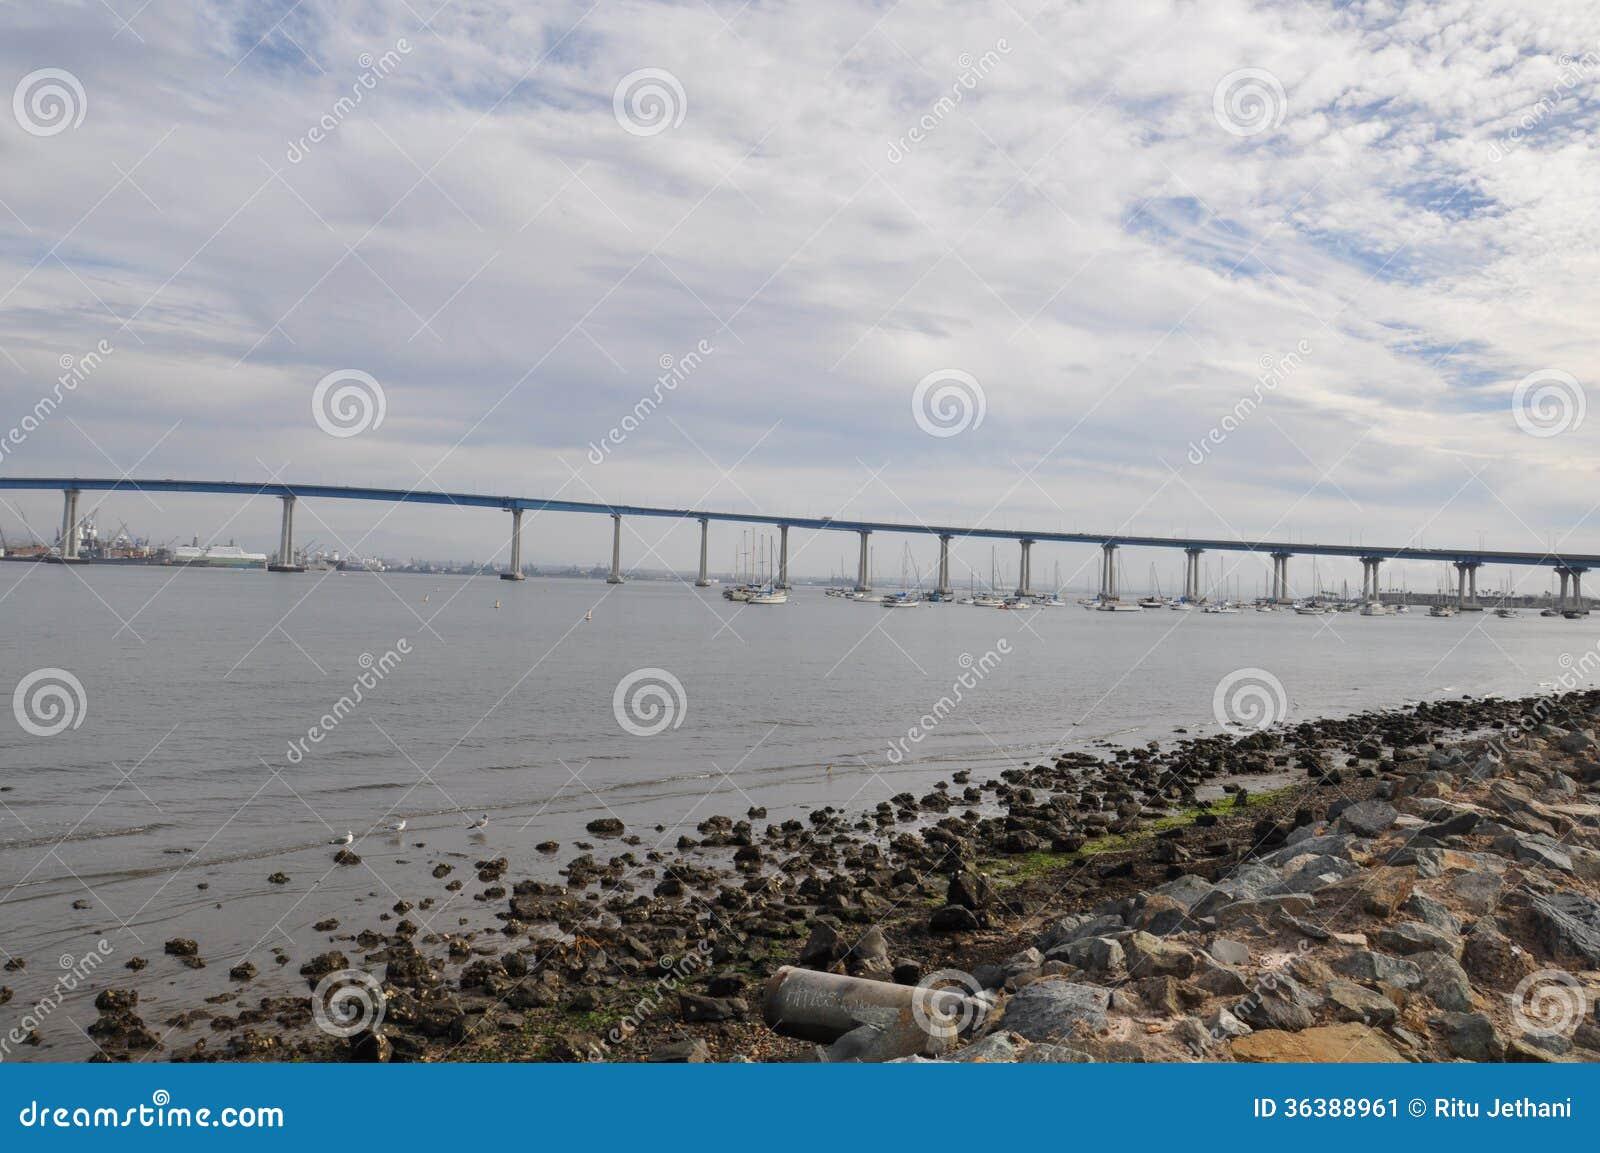 San Diego - Coronado Bridge in California